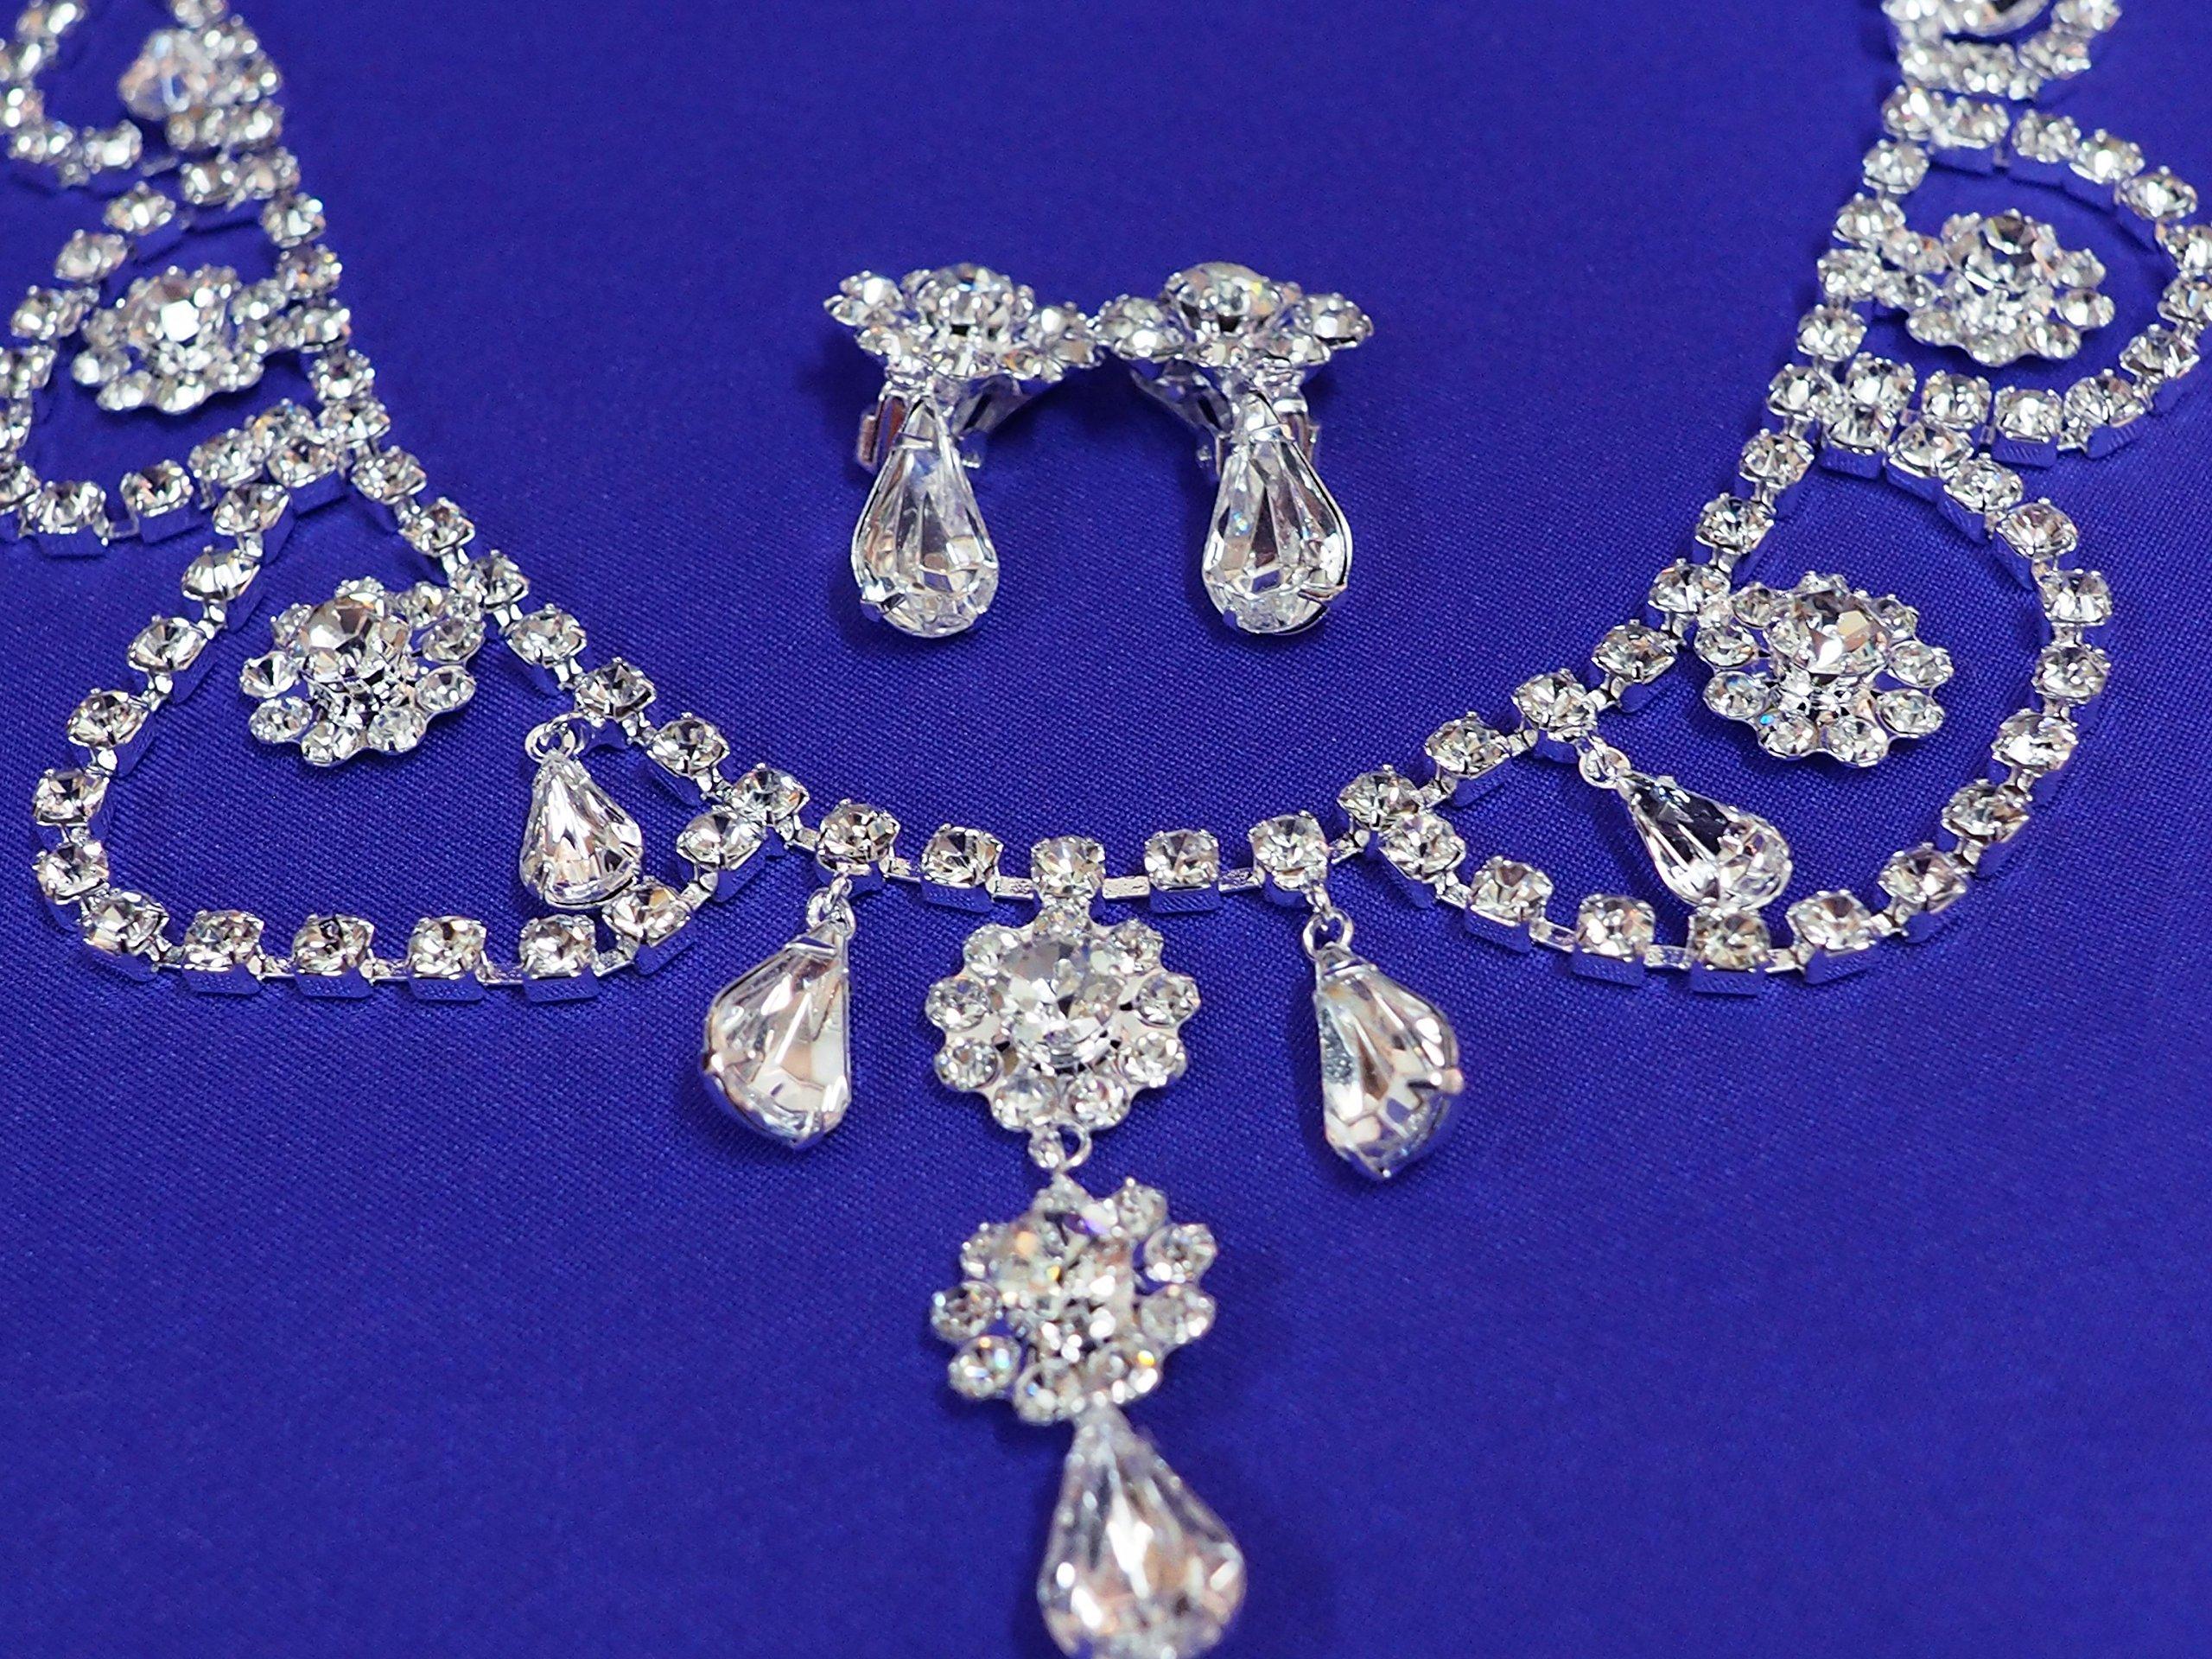 Audrey Hepburn Tiara and earrings Set